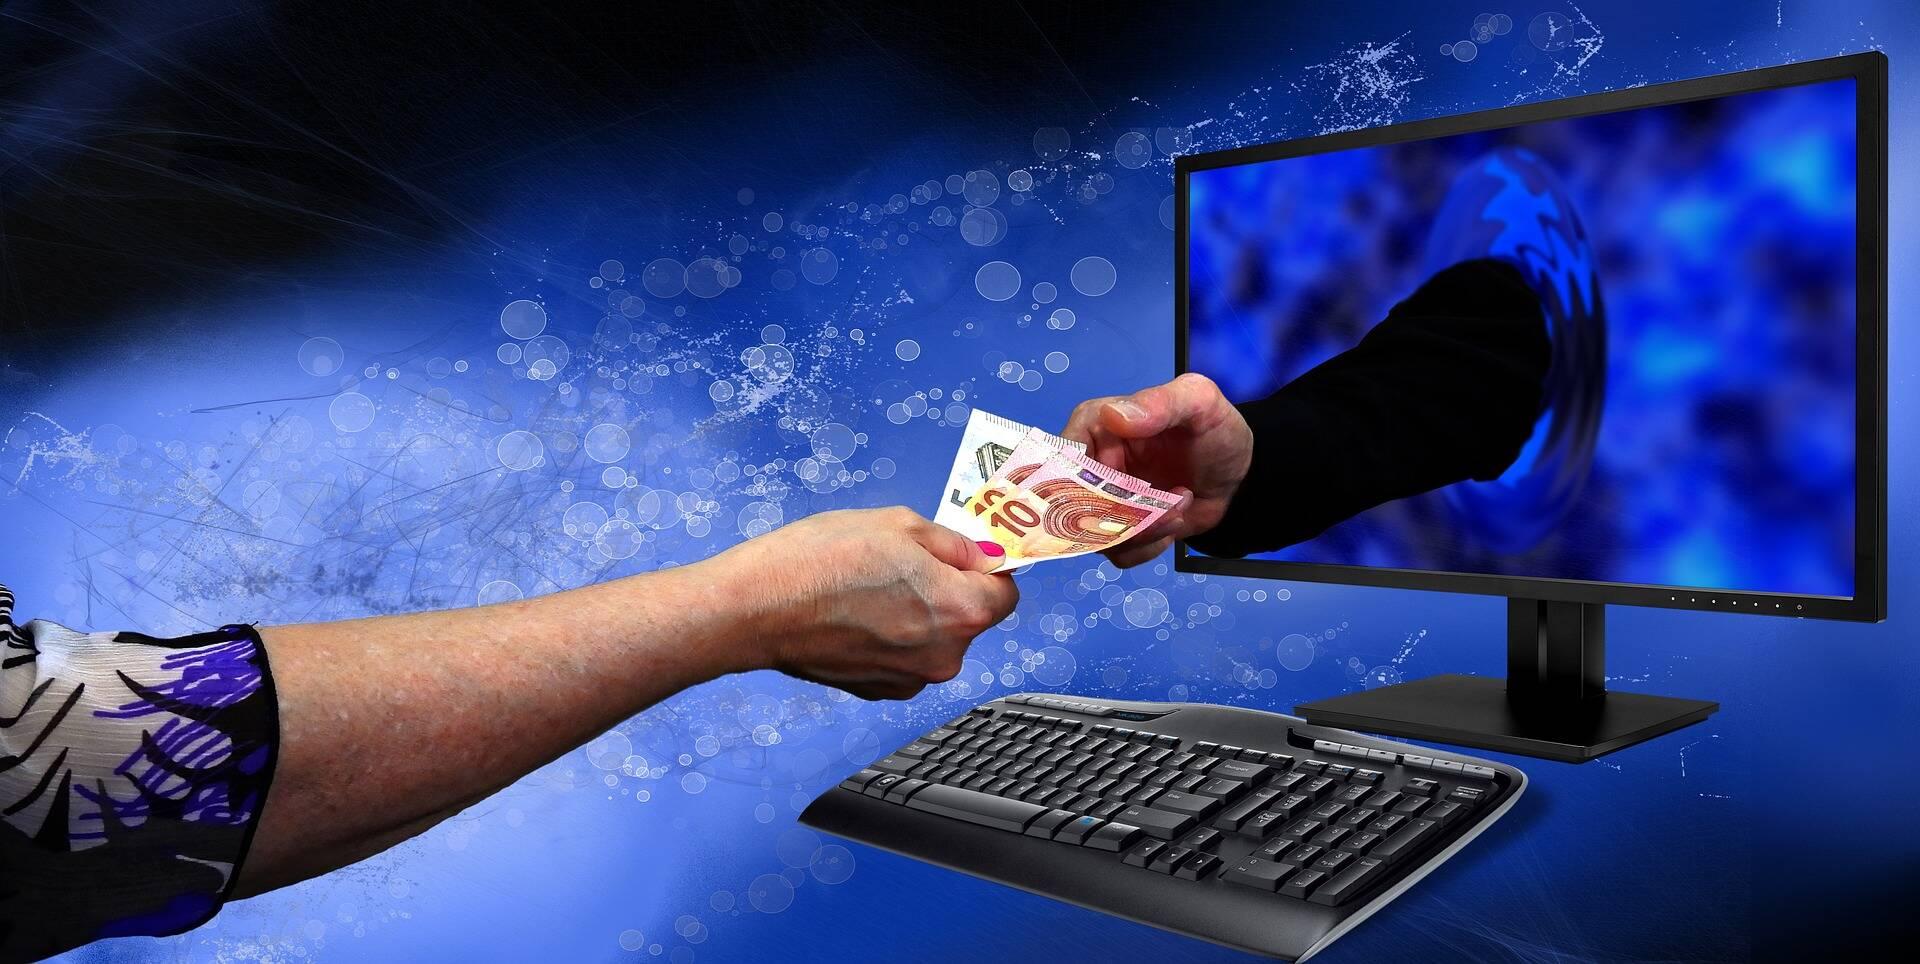 Cybercrimine Linux